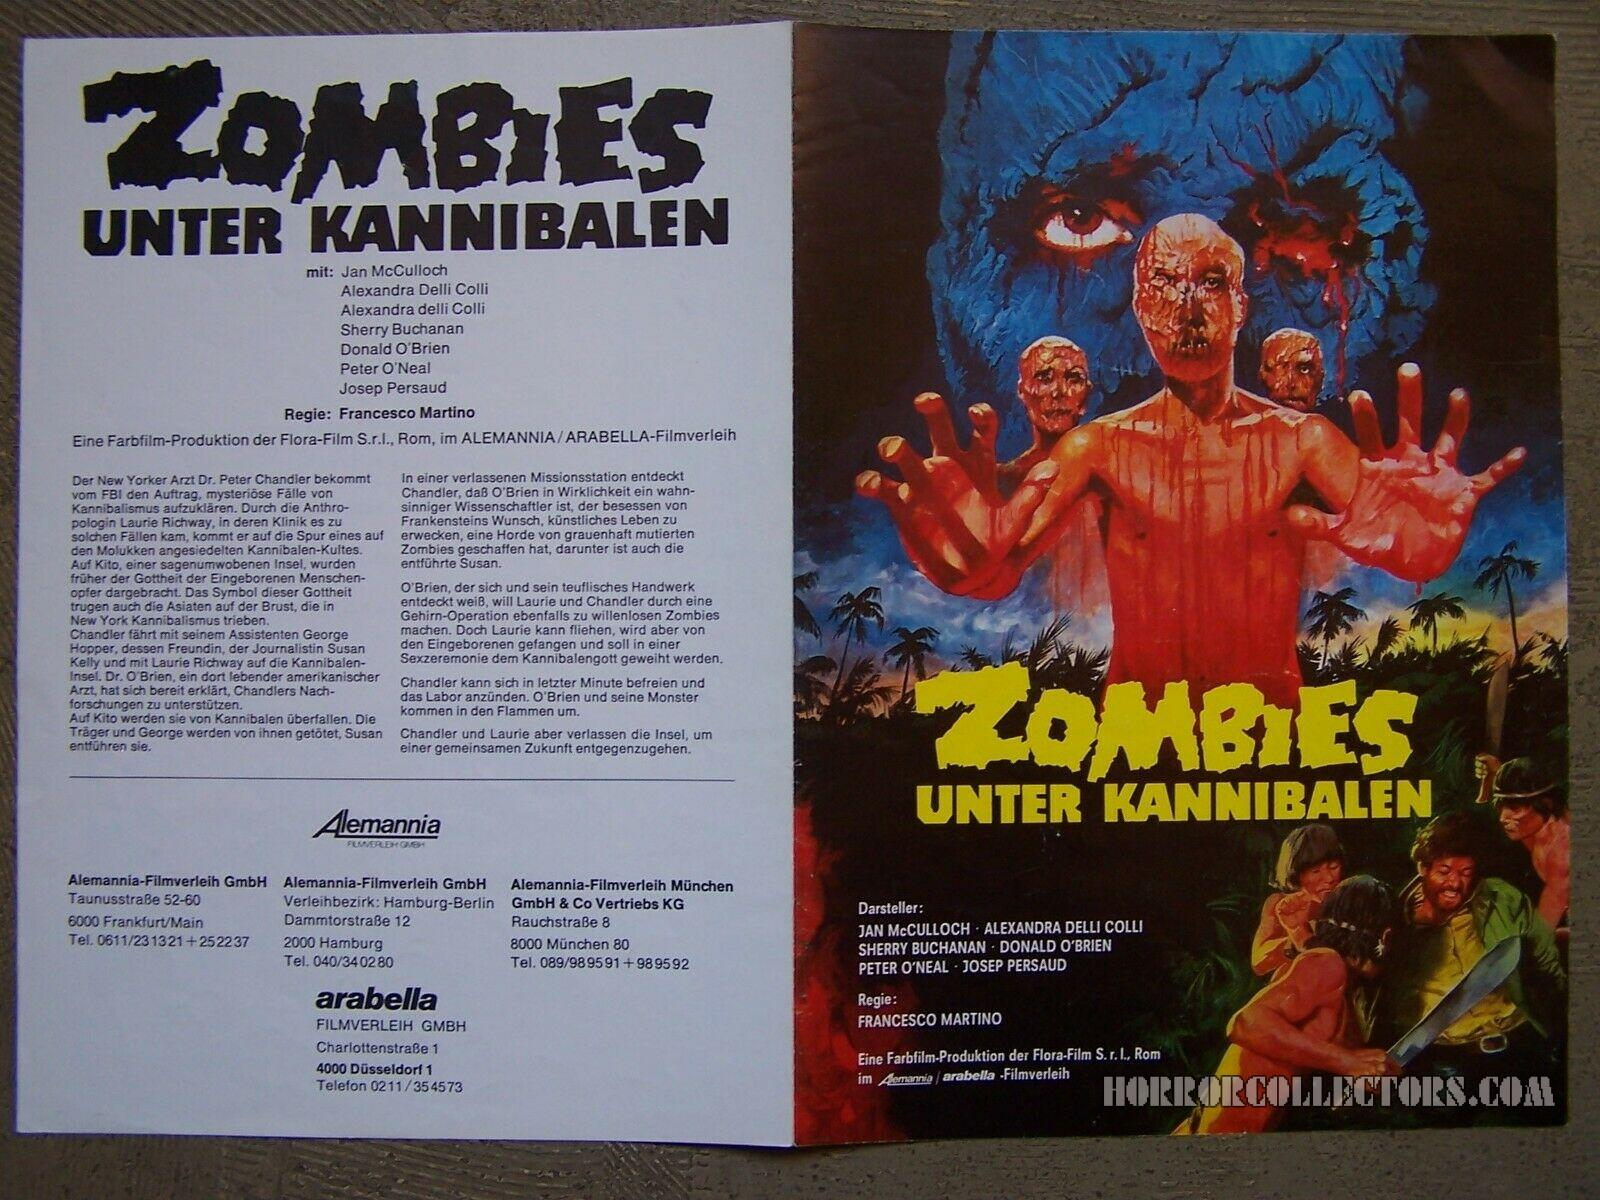 Zombies Unter Kannibalen German Press Book